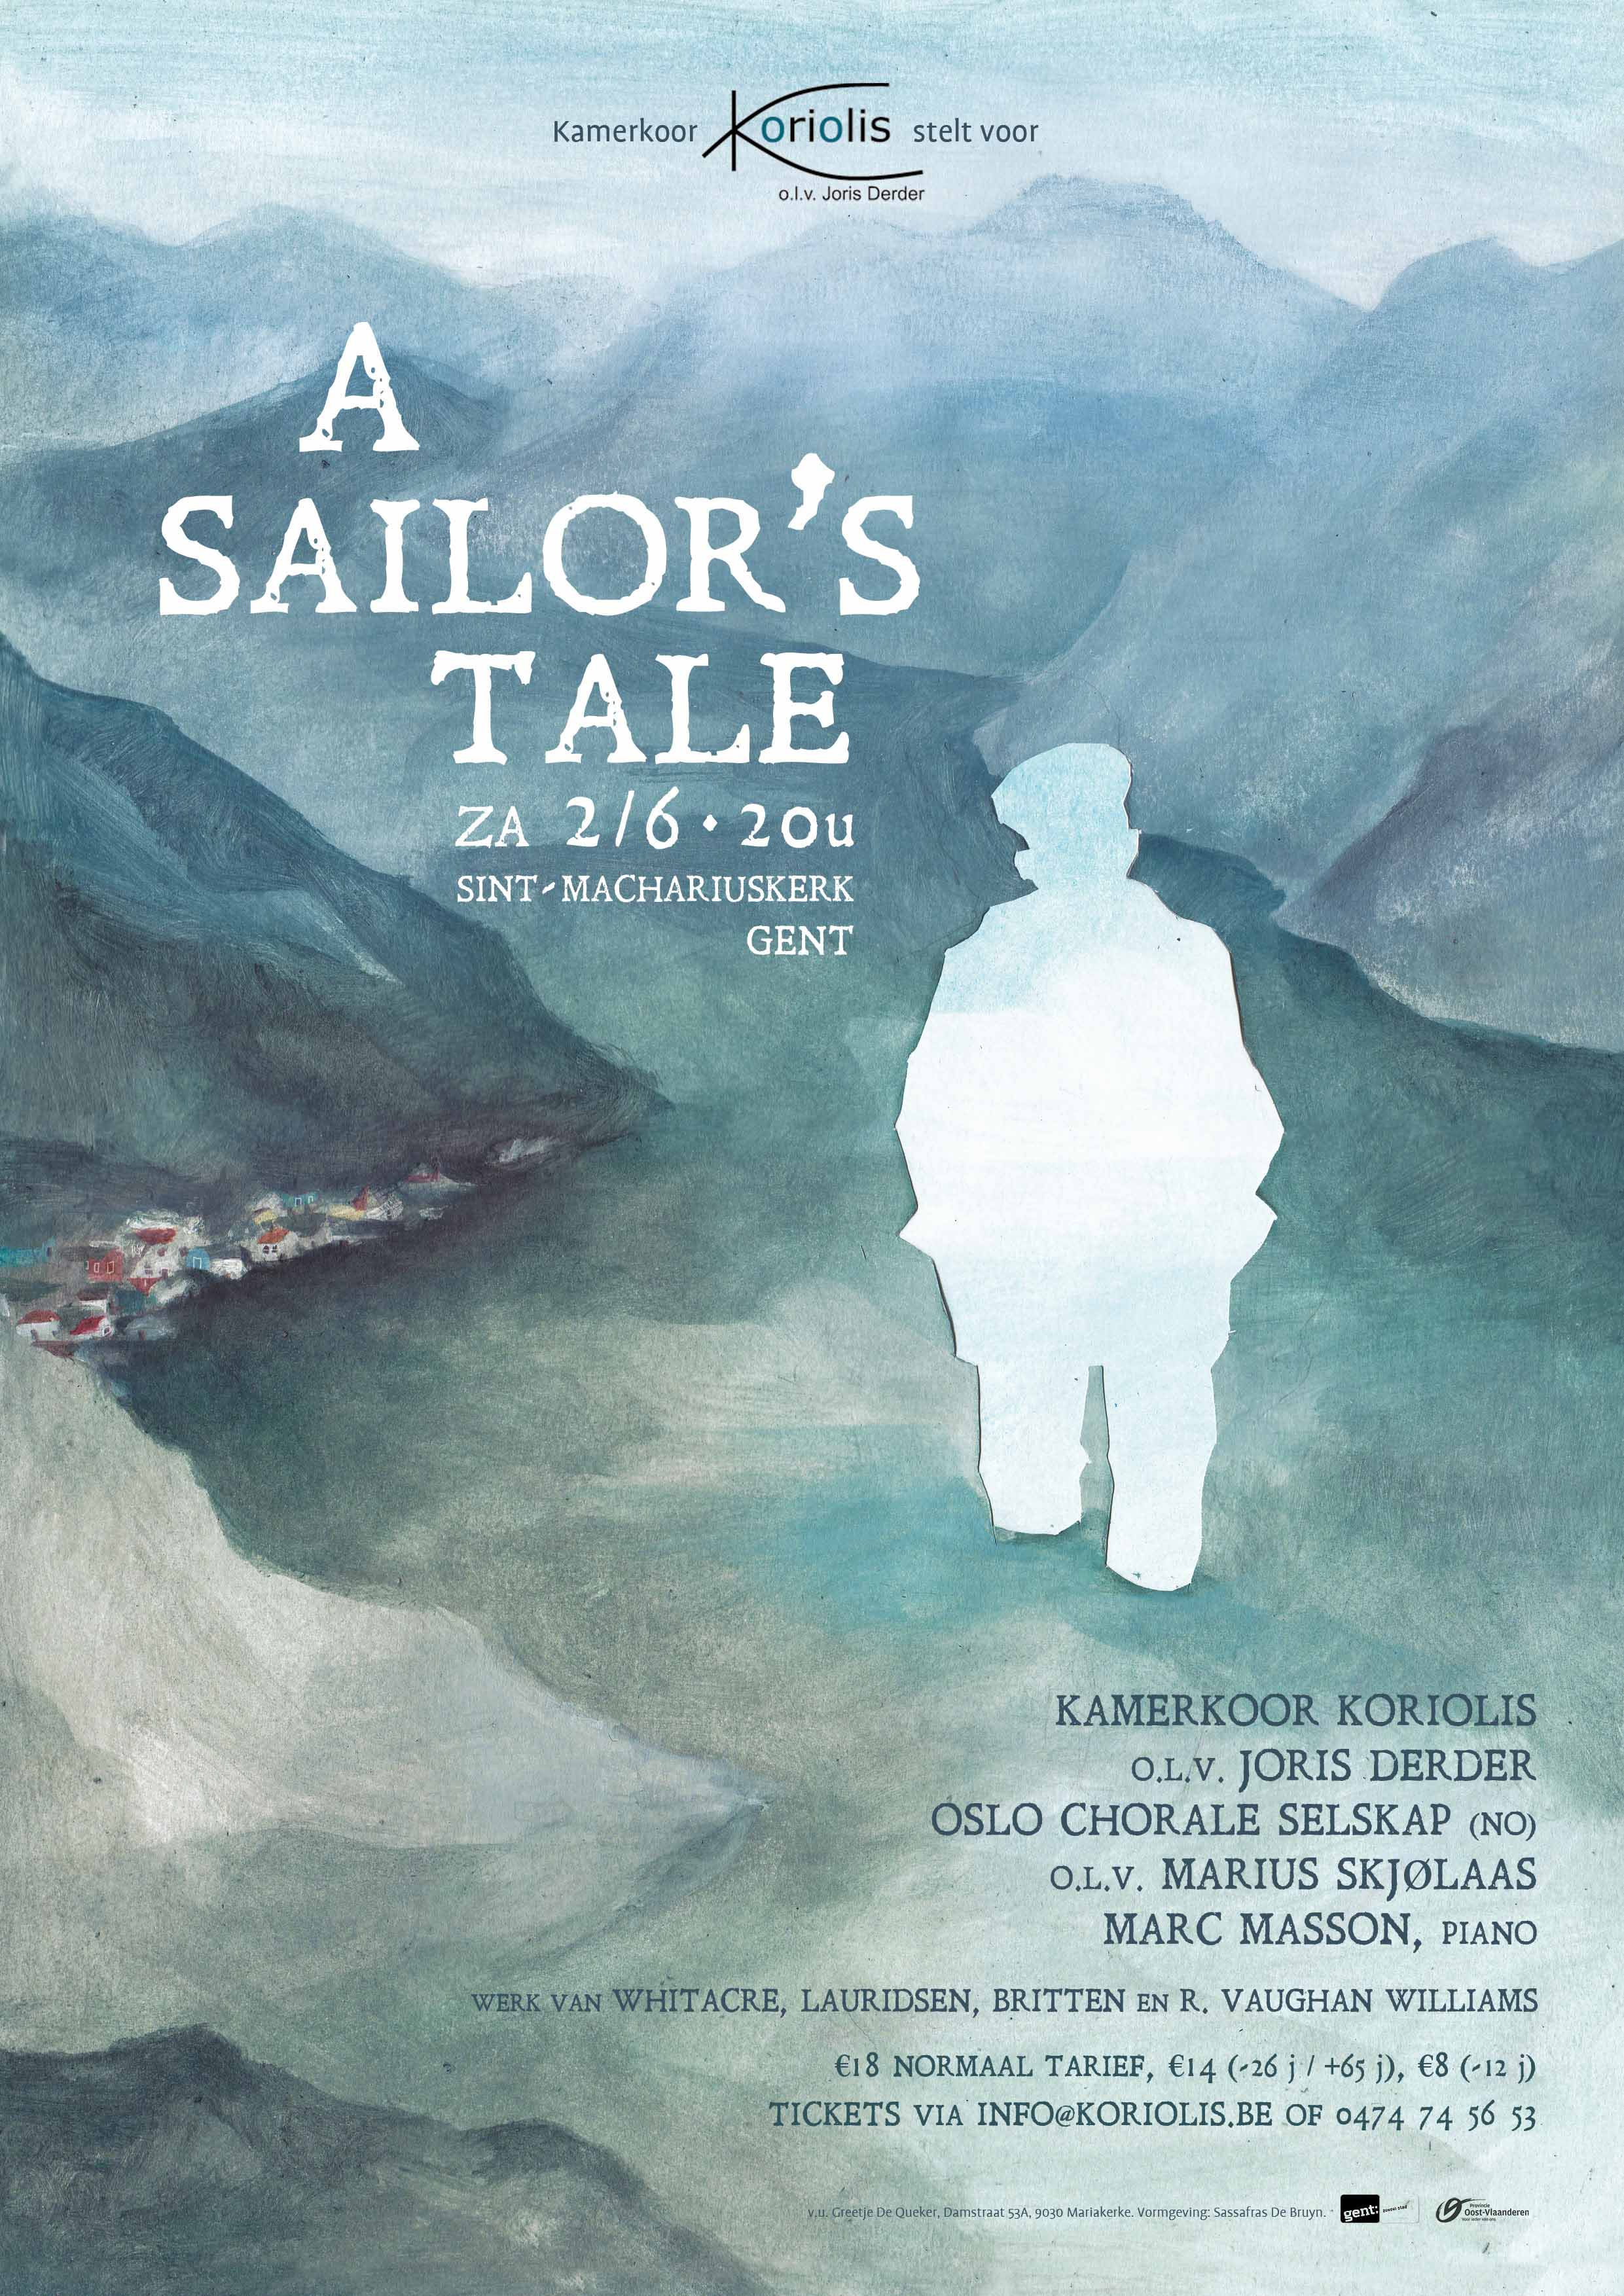 A sailor's tale